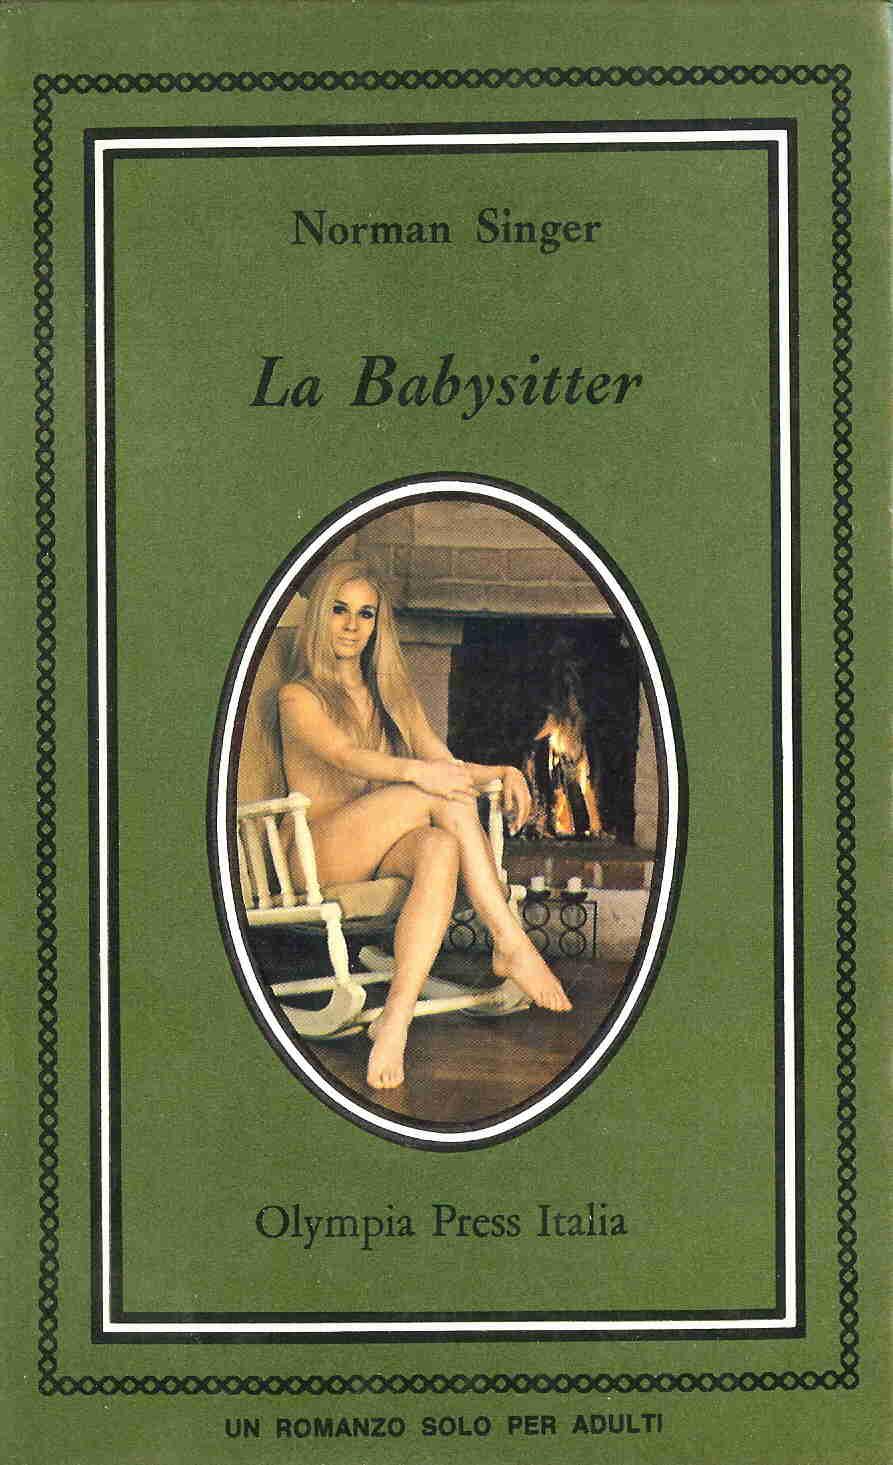 La babysitter